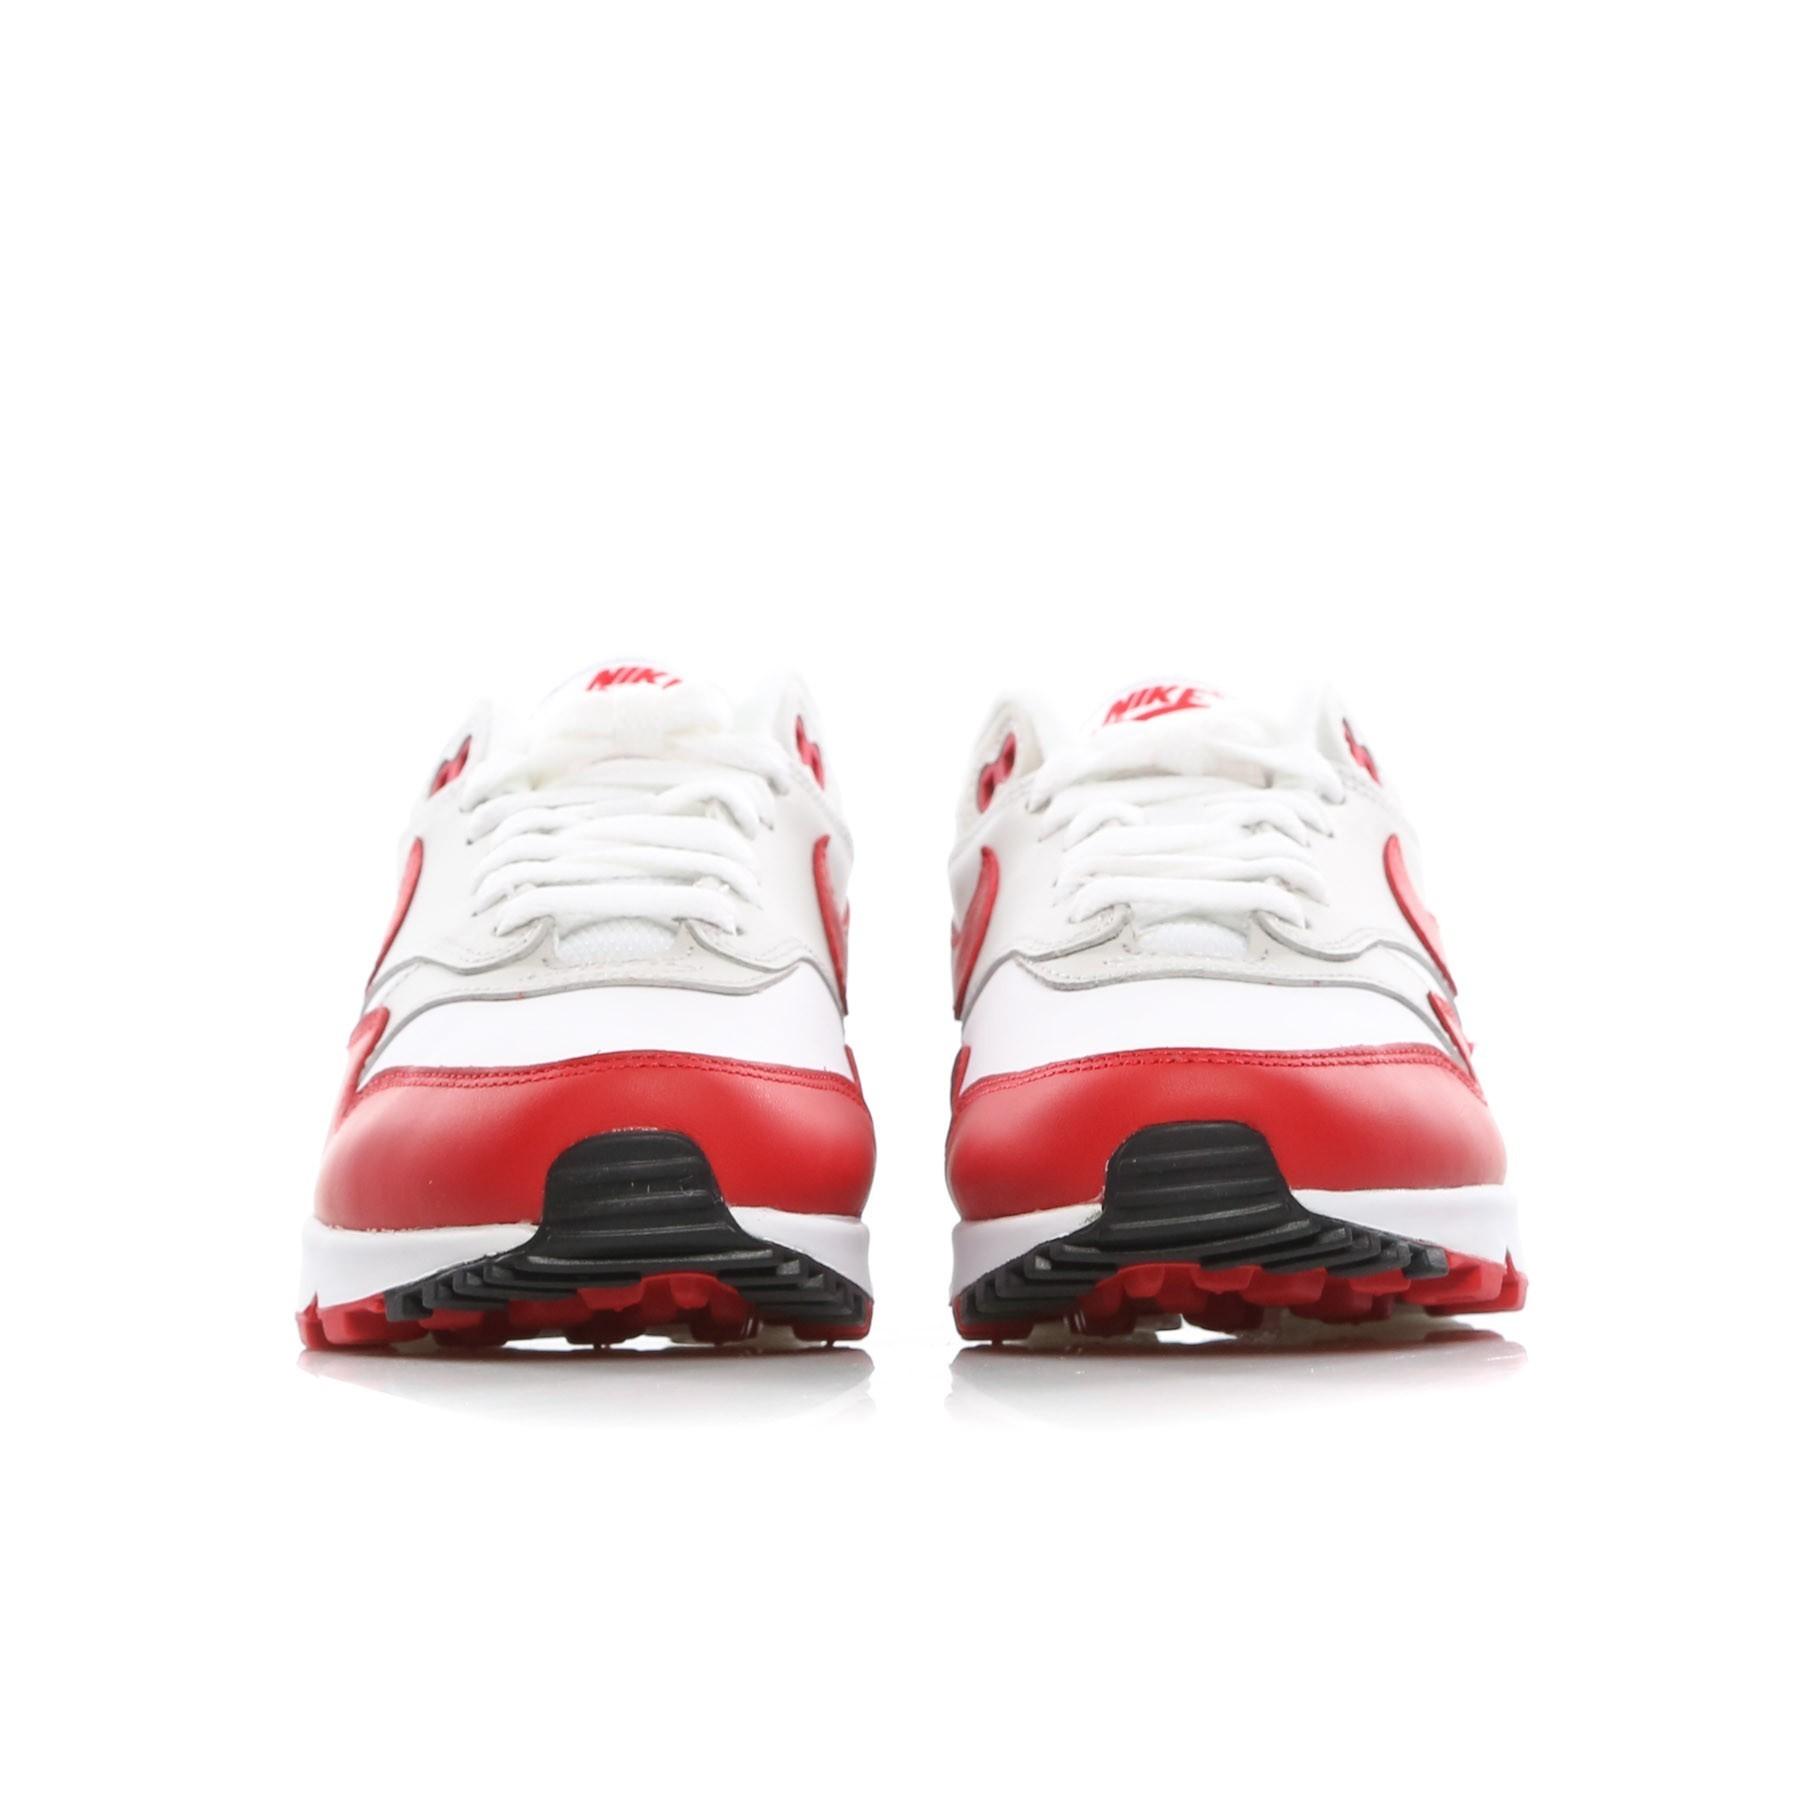 scarpa bassa donna w air max 90/1 WHITE/UNIVERSITY RED/NEUTRAL GREY/BLACK